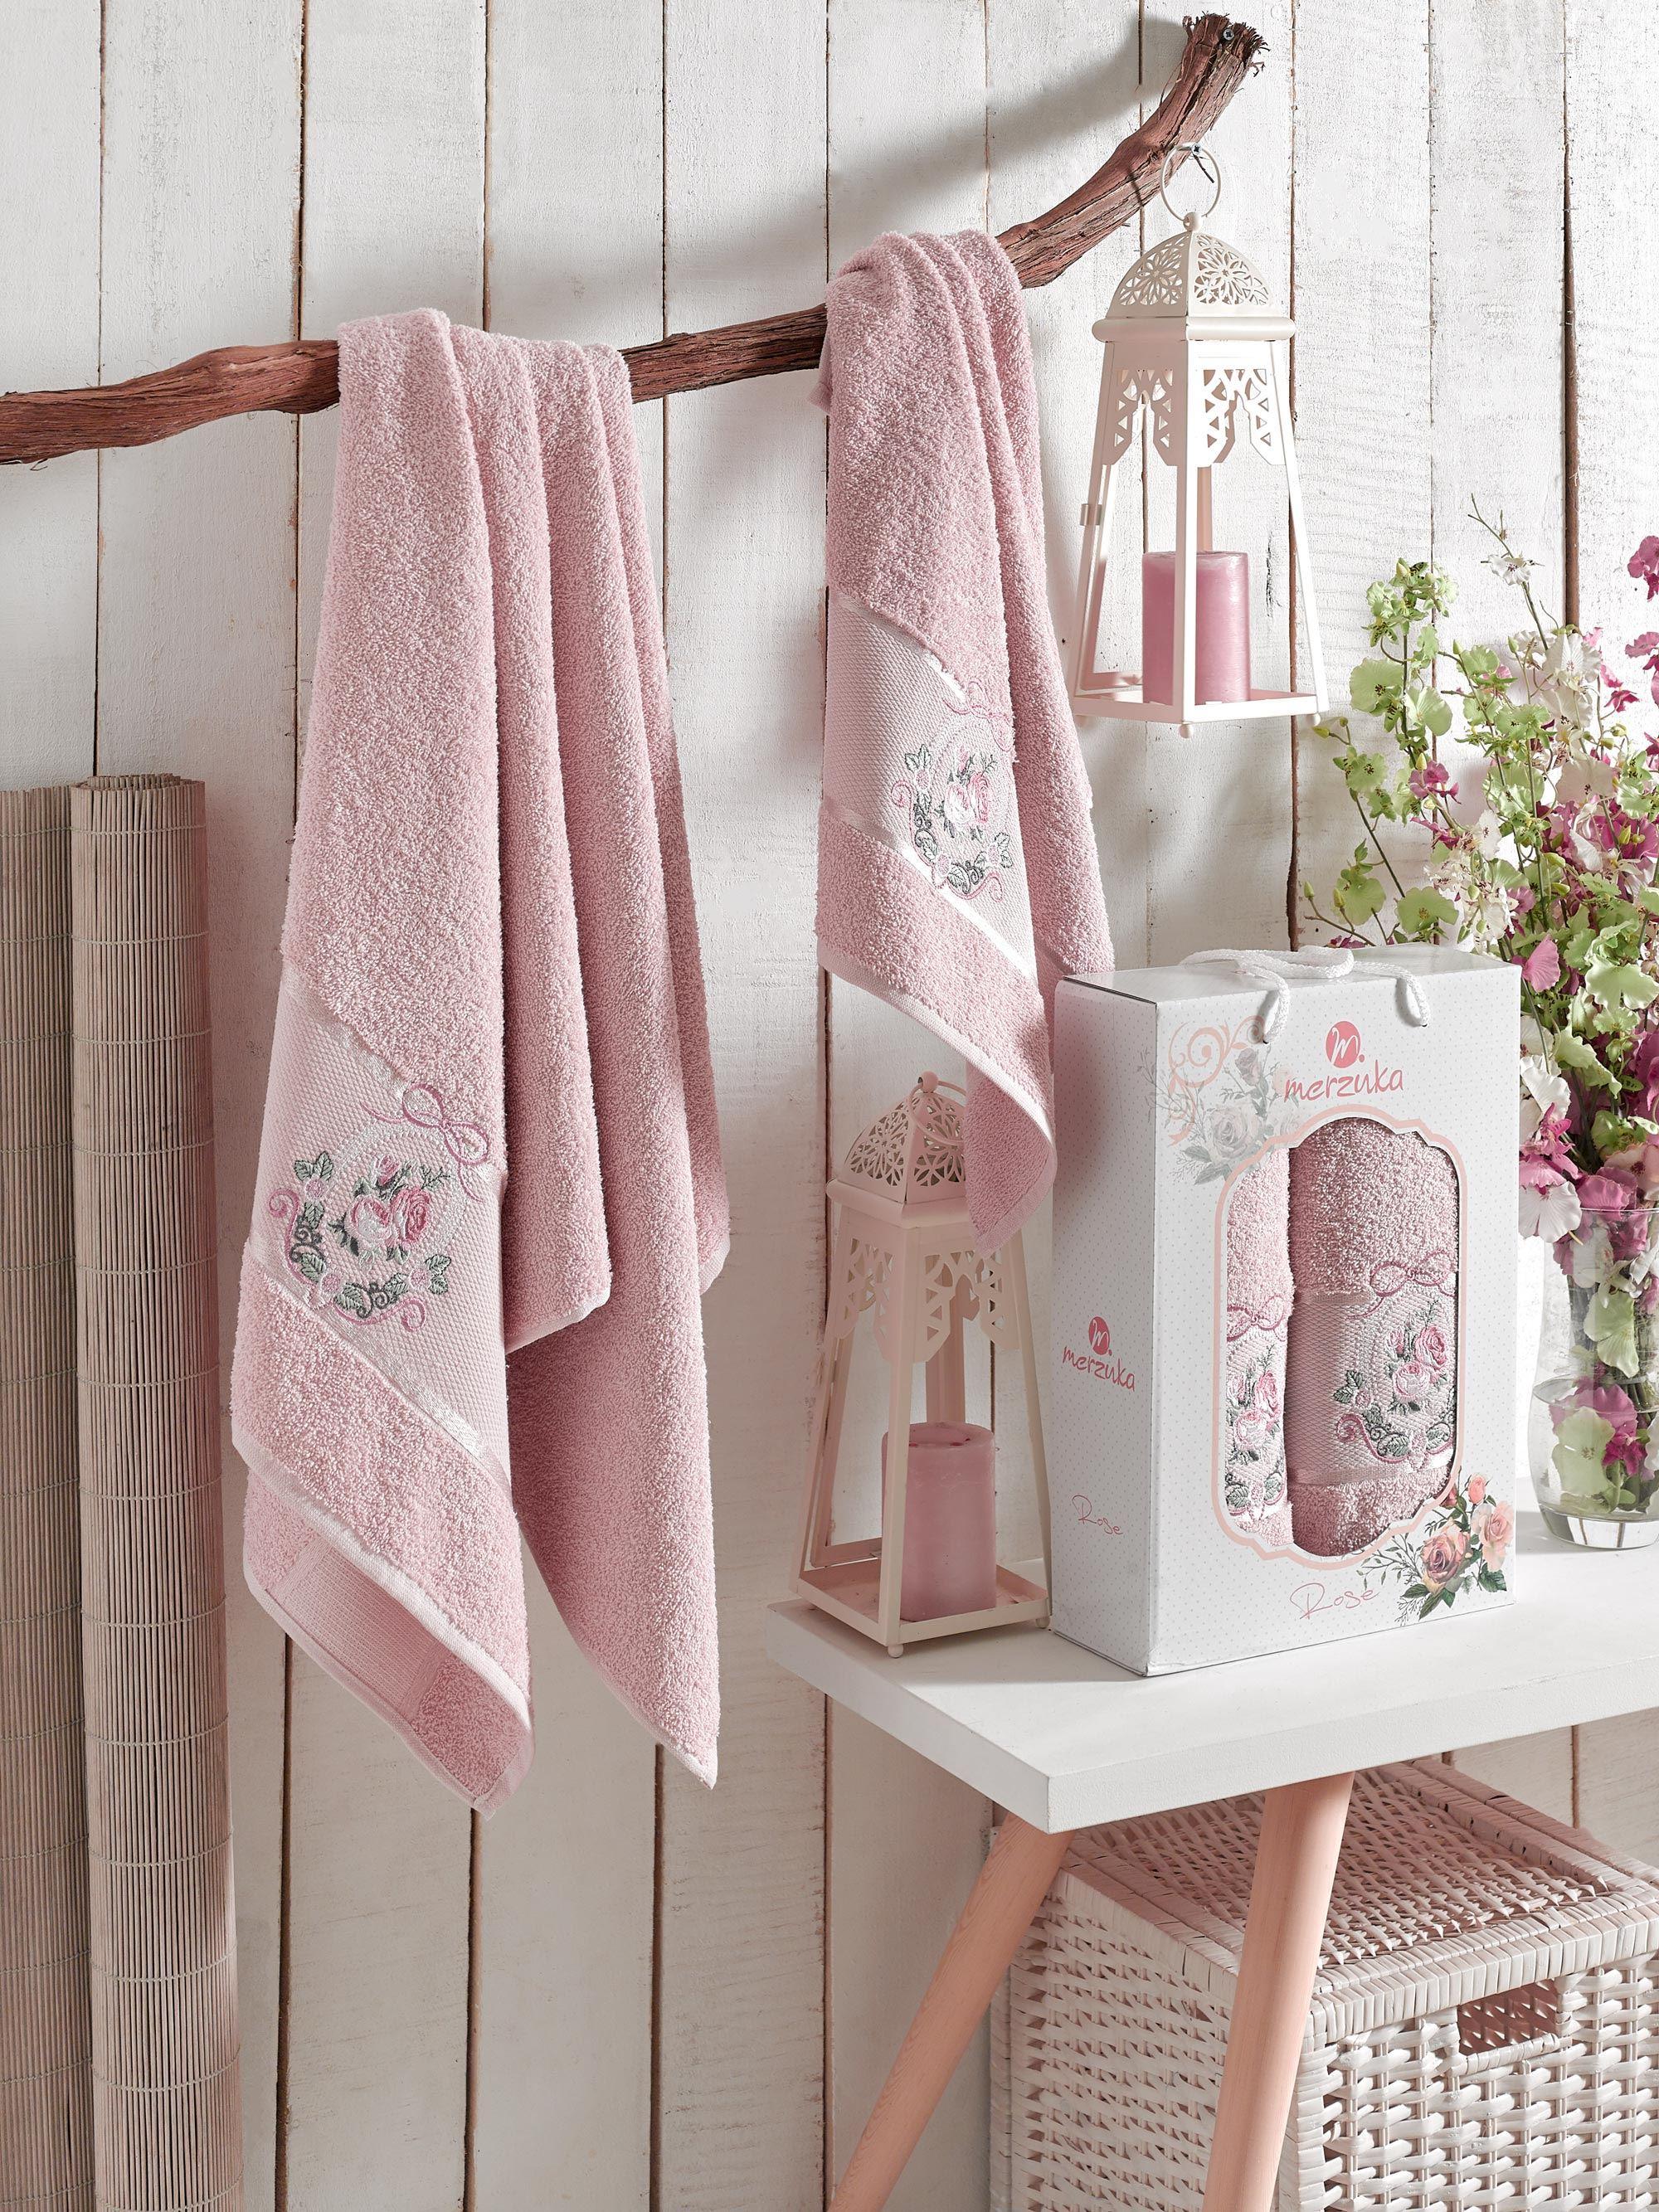 Полотенца Oran Merzuka Полотенце Rose Цвет: Розовый (50х80 см,70х130 см) набор из 3 полотенец merzuka sakura 50х90 2 70х140 8432 оранжевый